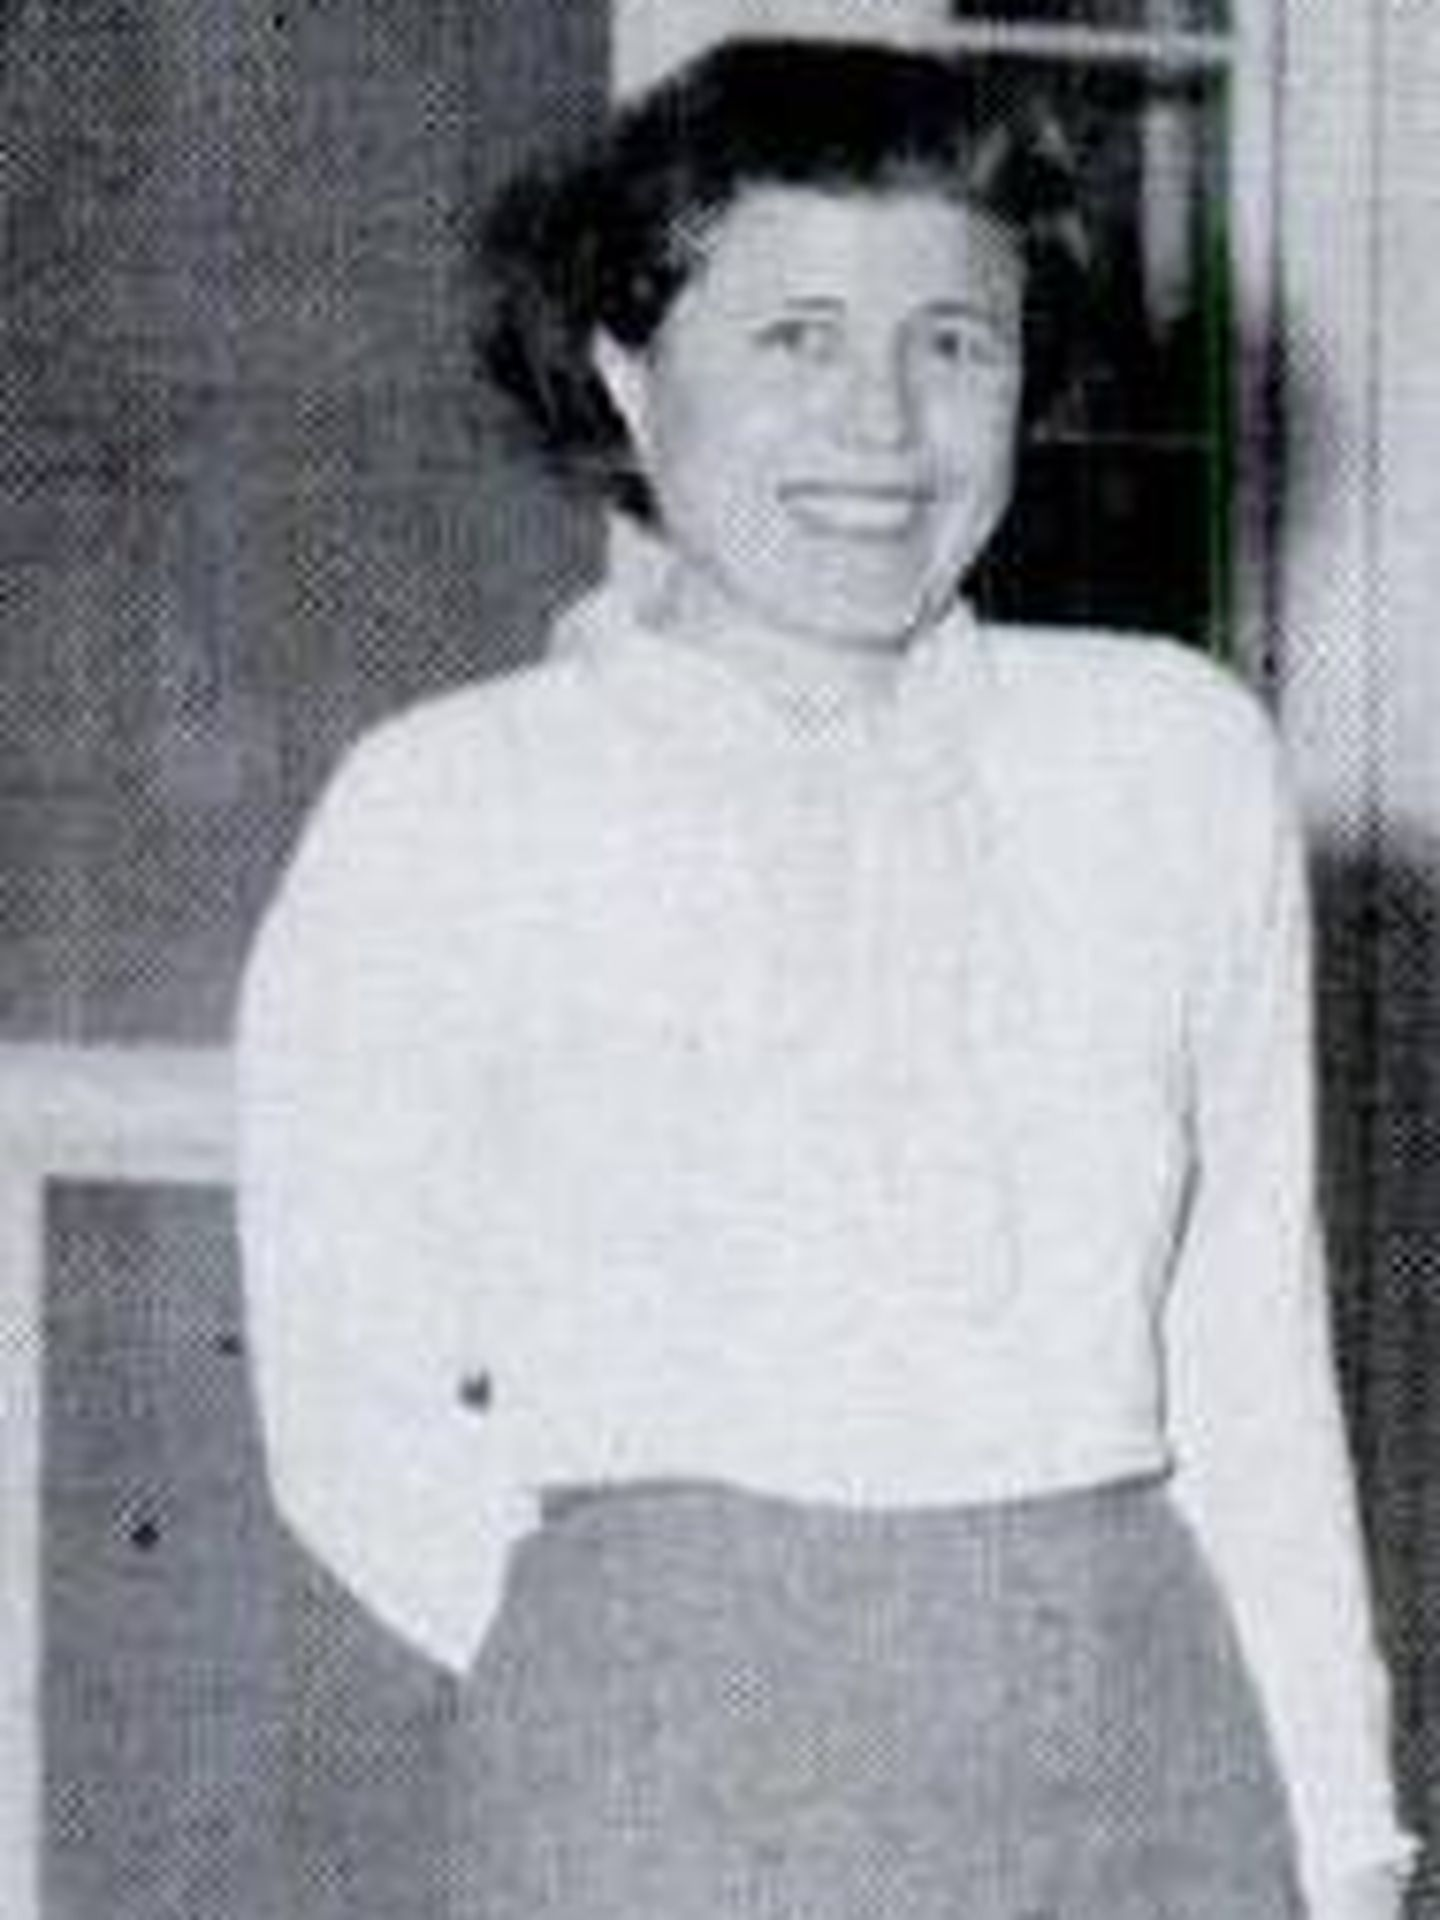 Klara von Neumann (Wikimedia Commons)